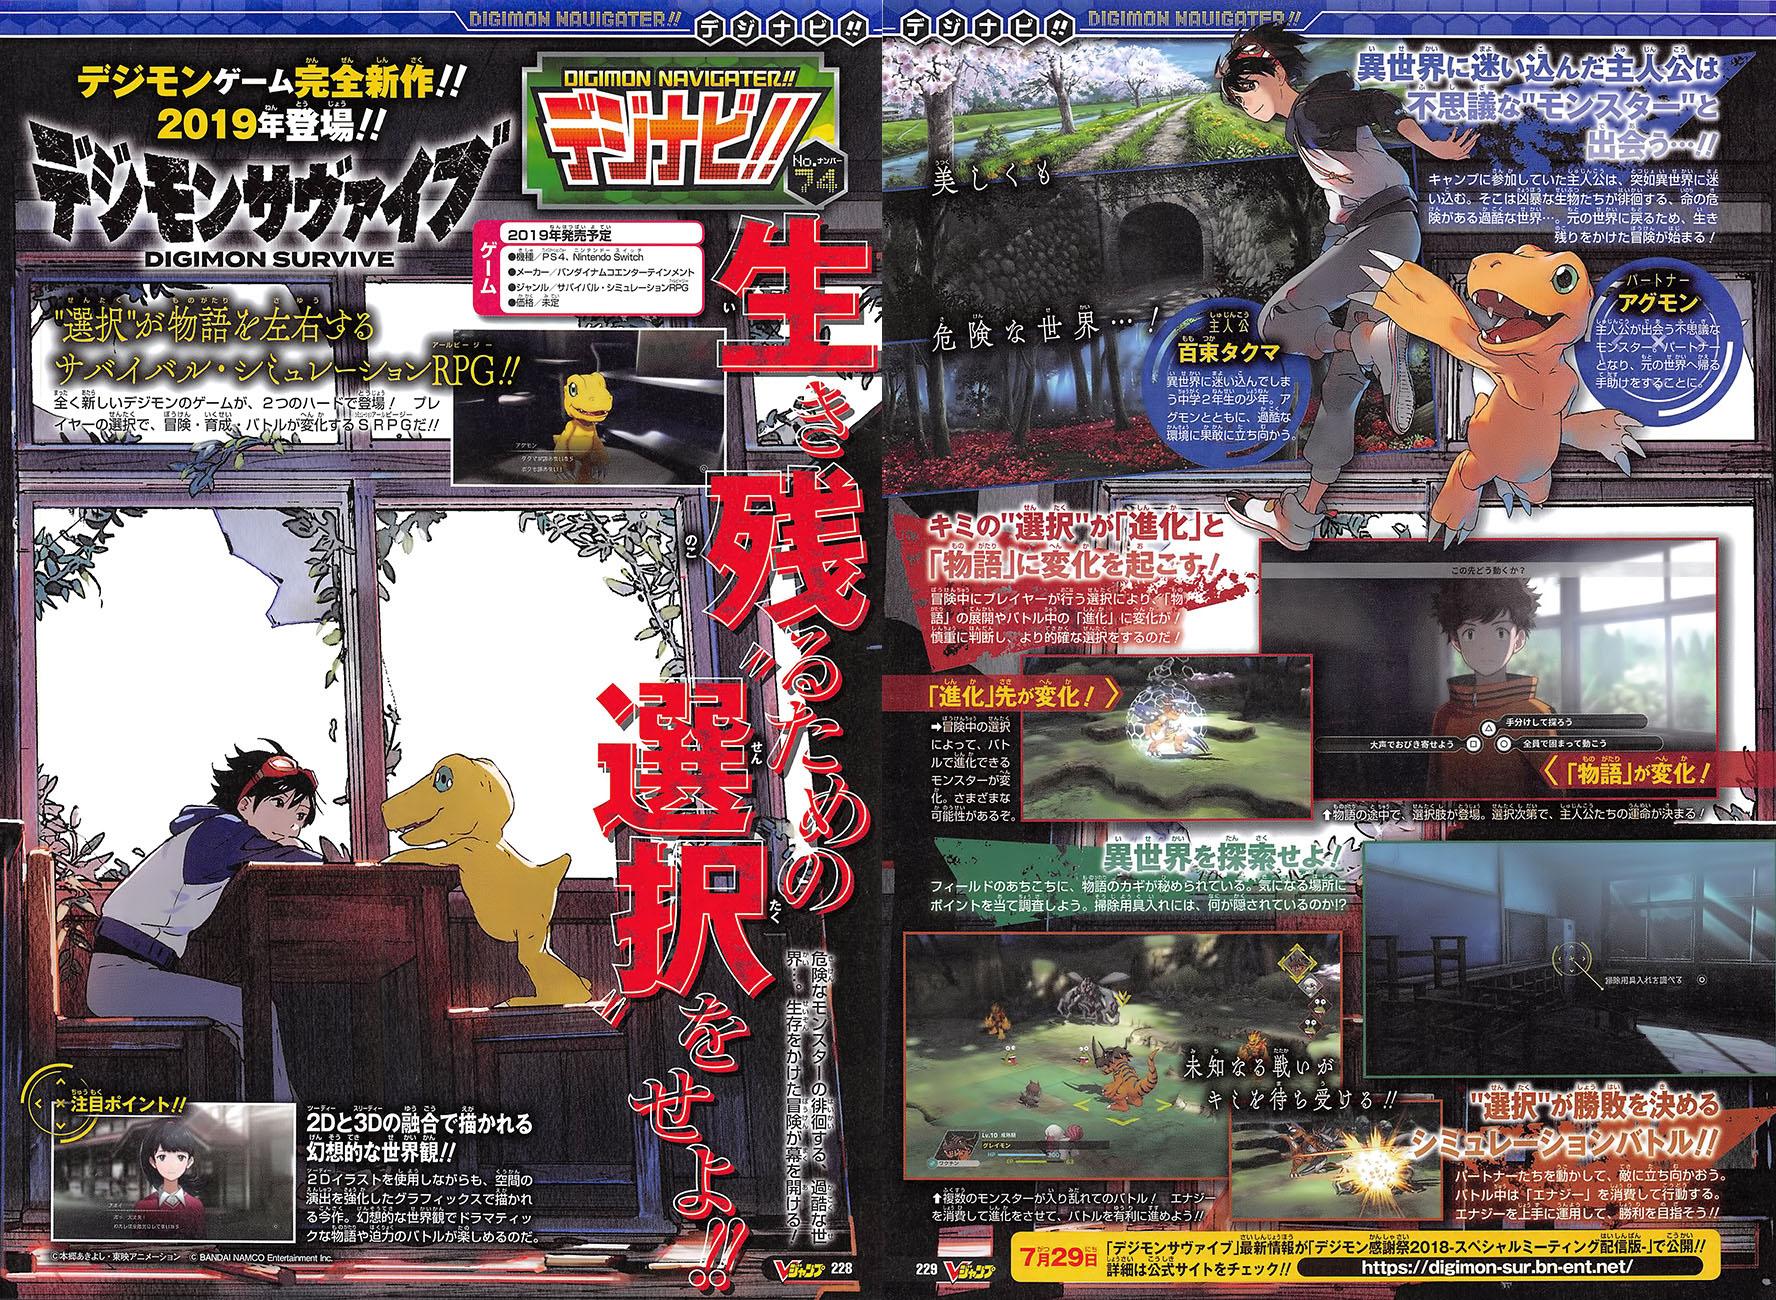 Digimon-Survive-Scan_07-18-18_001.jpg